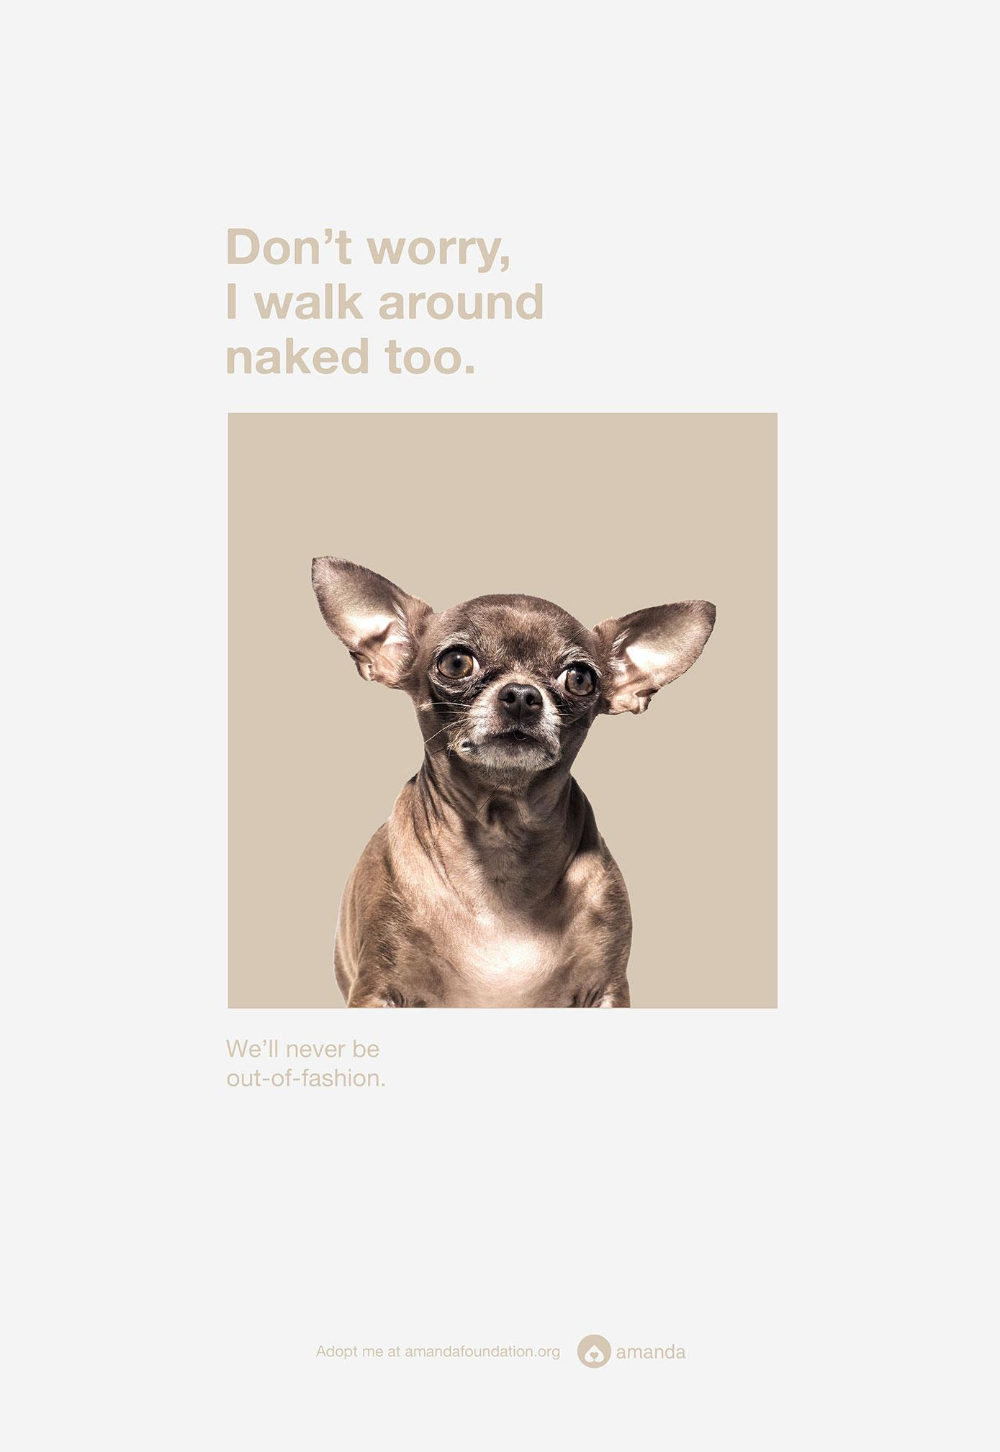 Amanda Foundation Print Advert By Saatchi Saatchi Chihuahua Ads Of The World Saatchi Saatchi Chihuahua Print